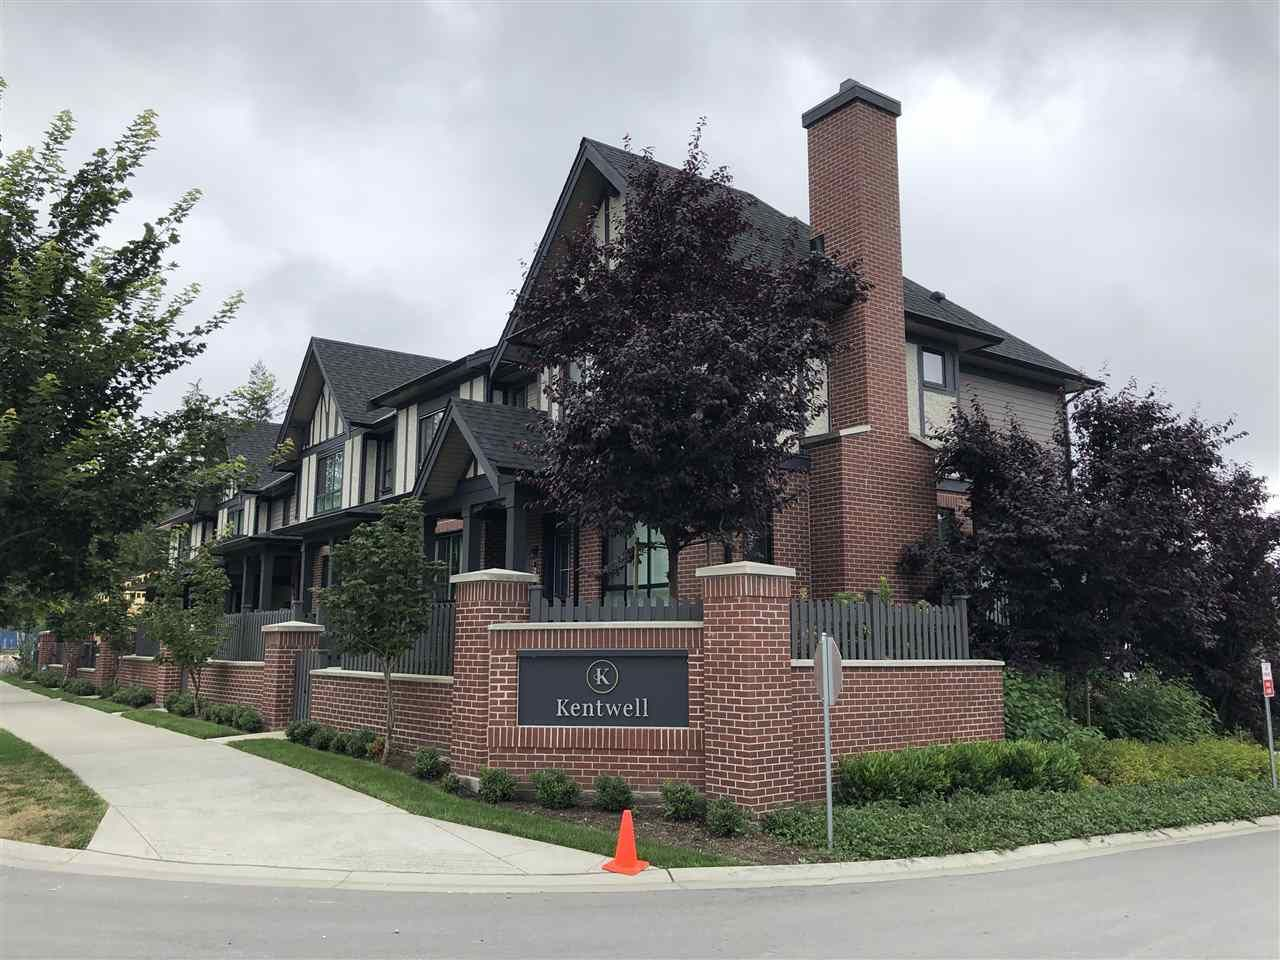 Main Photo: 44 3500 BURKE VILLAGE Promenade in Coquitlam: Burke Mountain Townhouse for sale : MLS®# R2518792